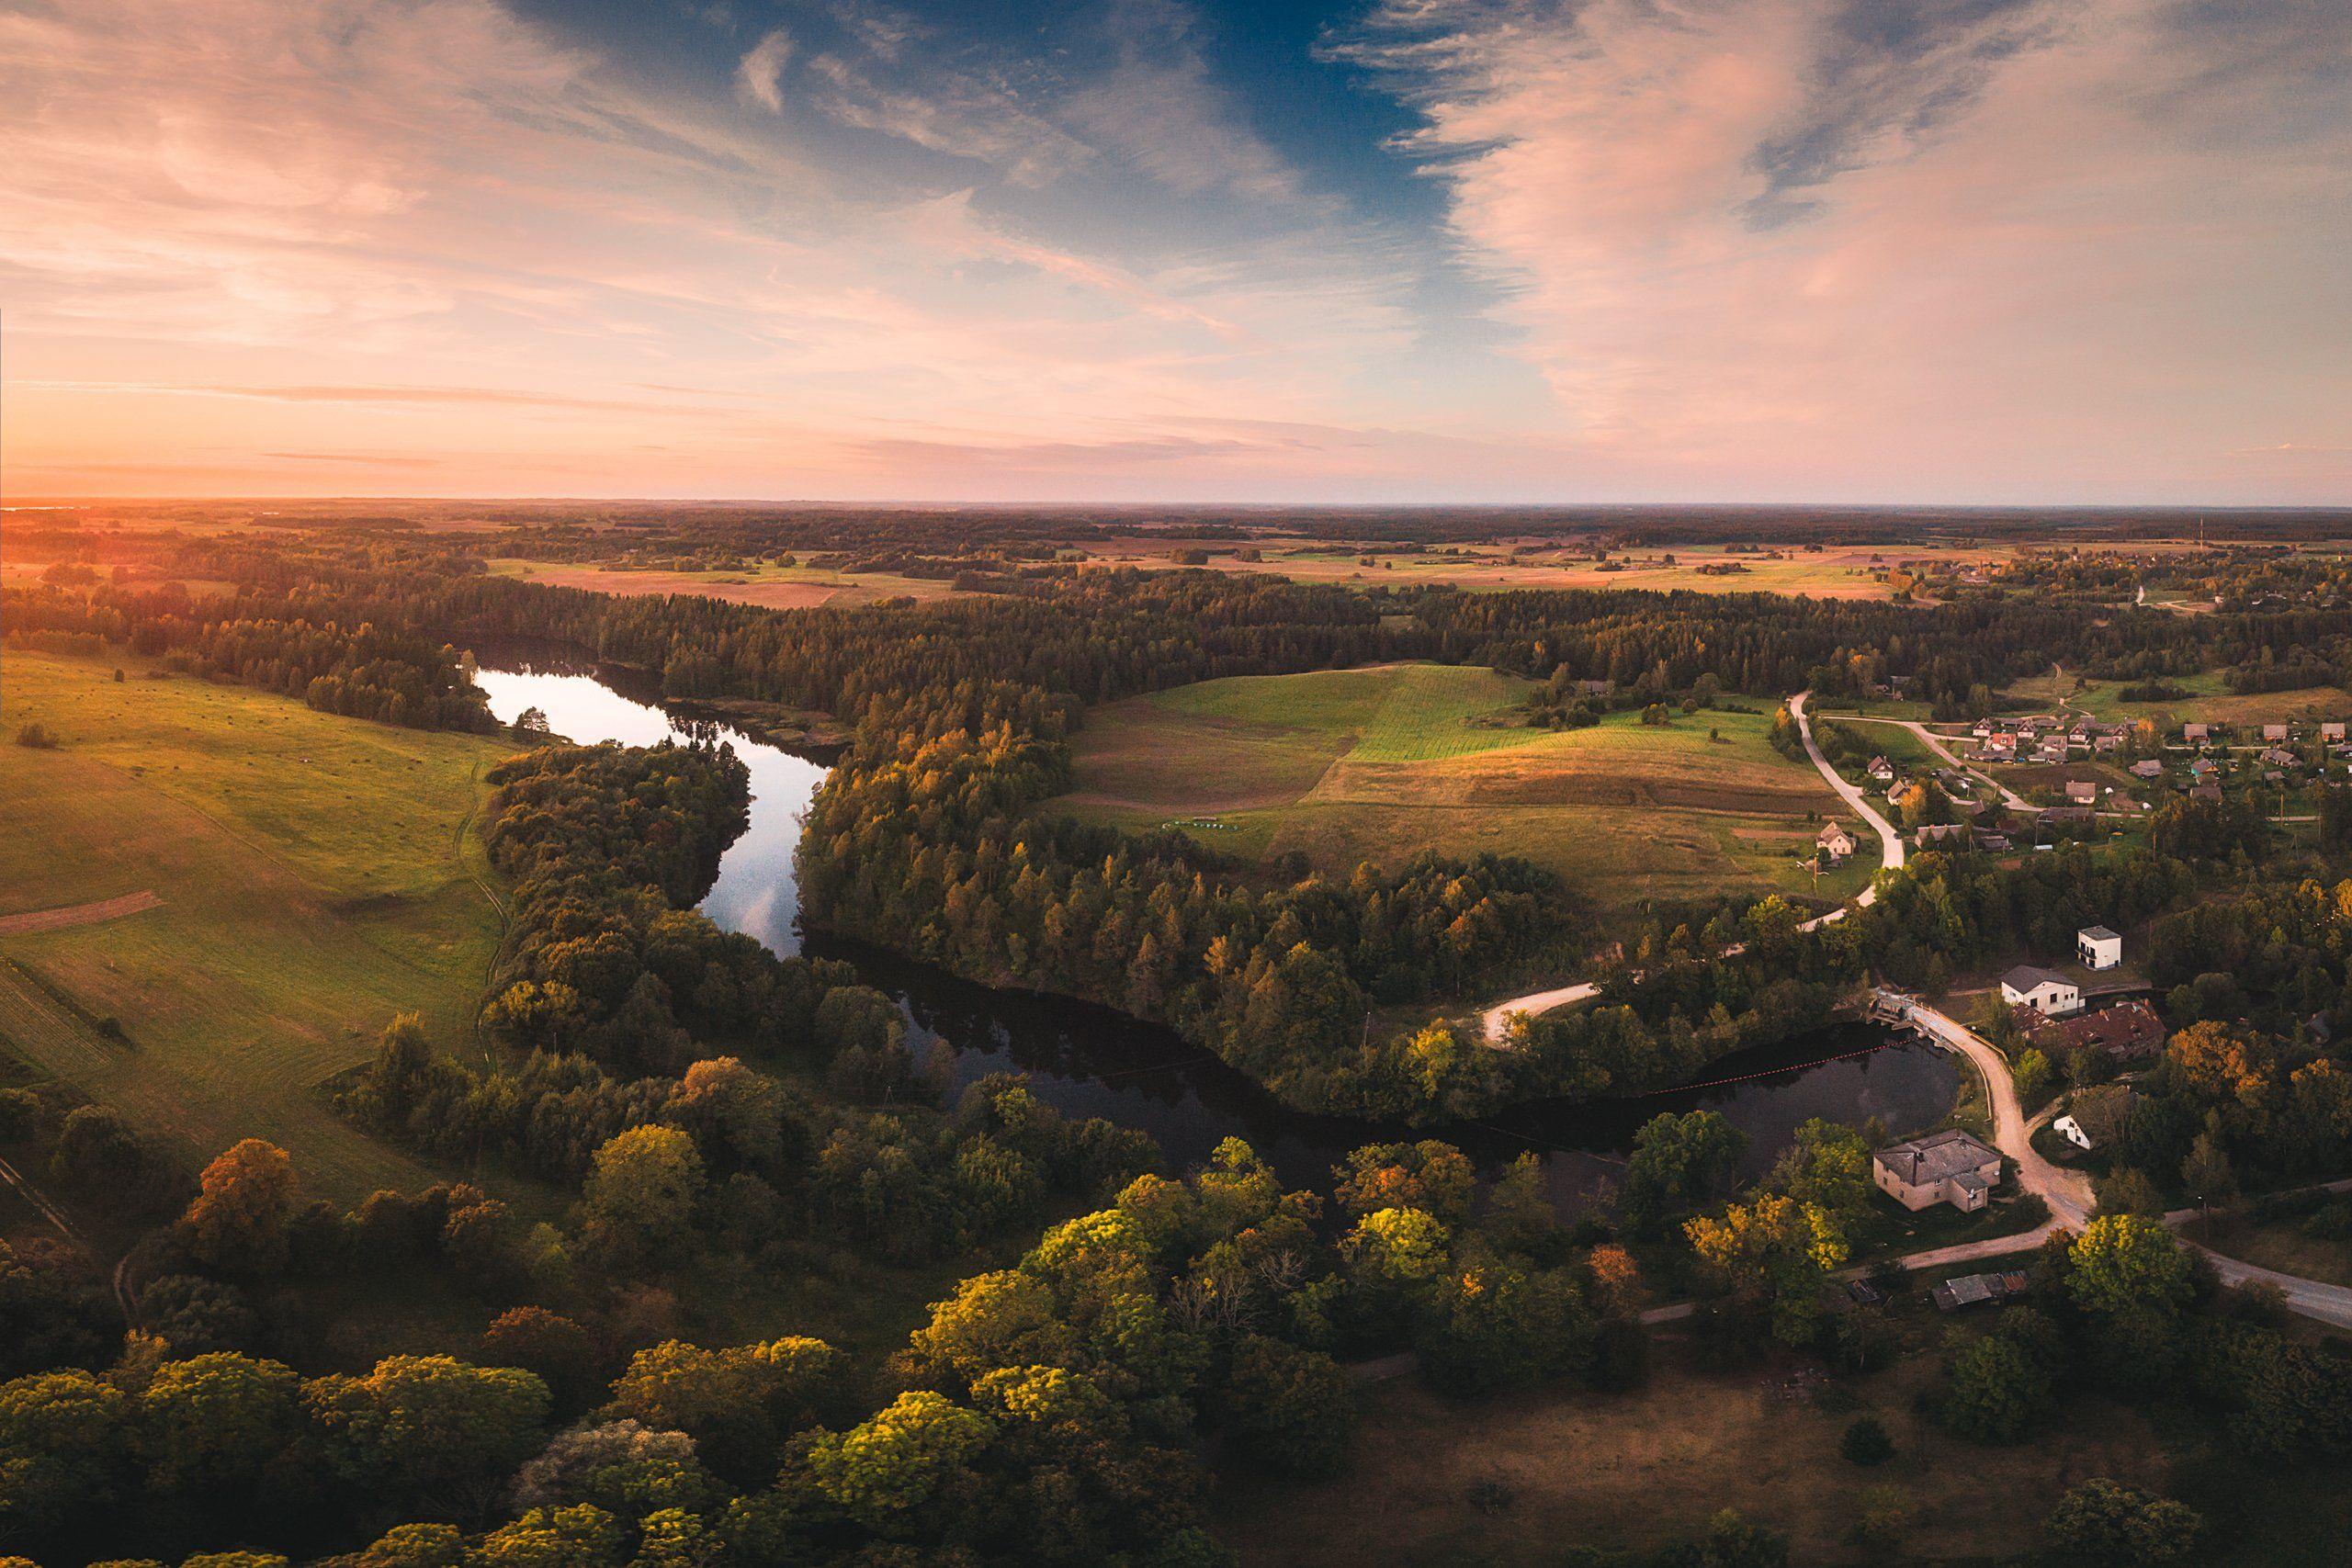 landscape,summer,drone,river,sunset,пейзаж,речка,латгалия,закат, Olegs Bucis